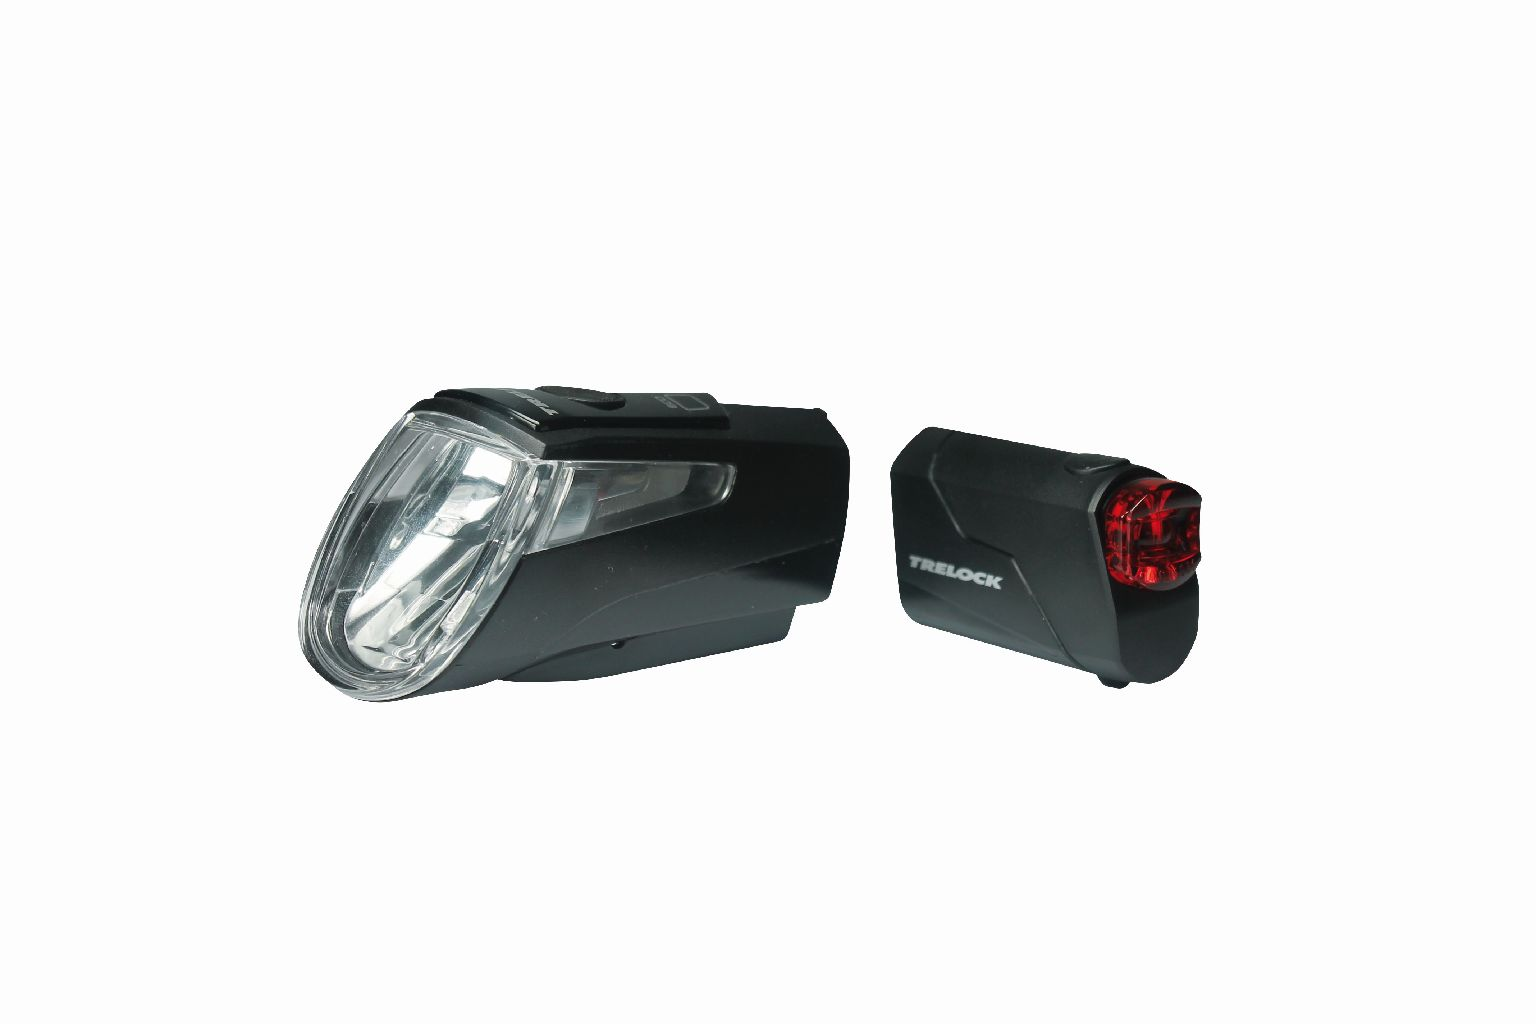 Trelock Lichtset vo. + hi. LS 460 I-GO® POWER / LS 720 Kombi-Set schwarz - Bikedreams & Dustbikes